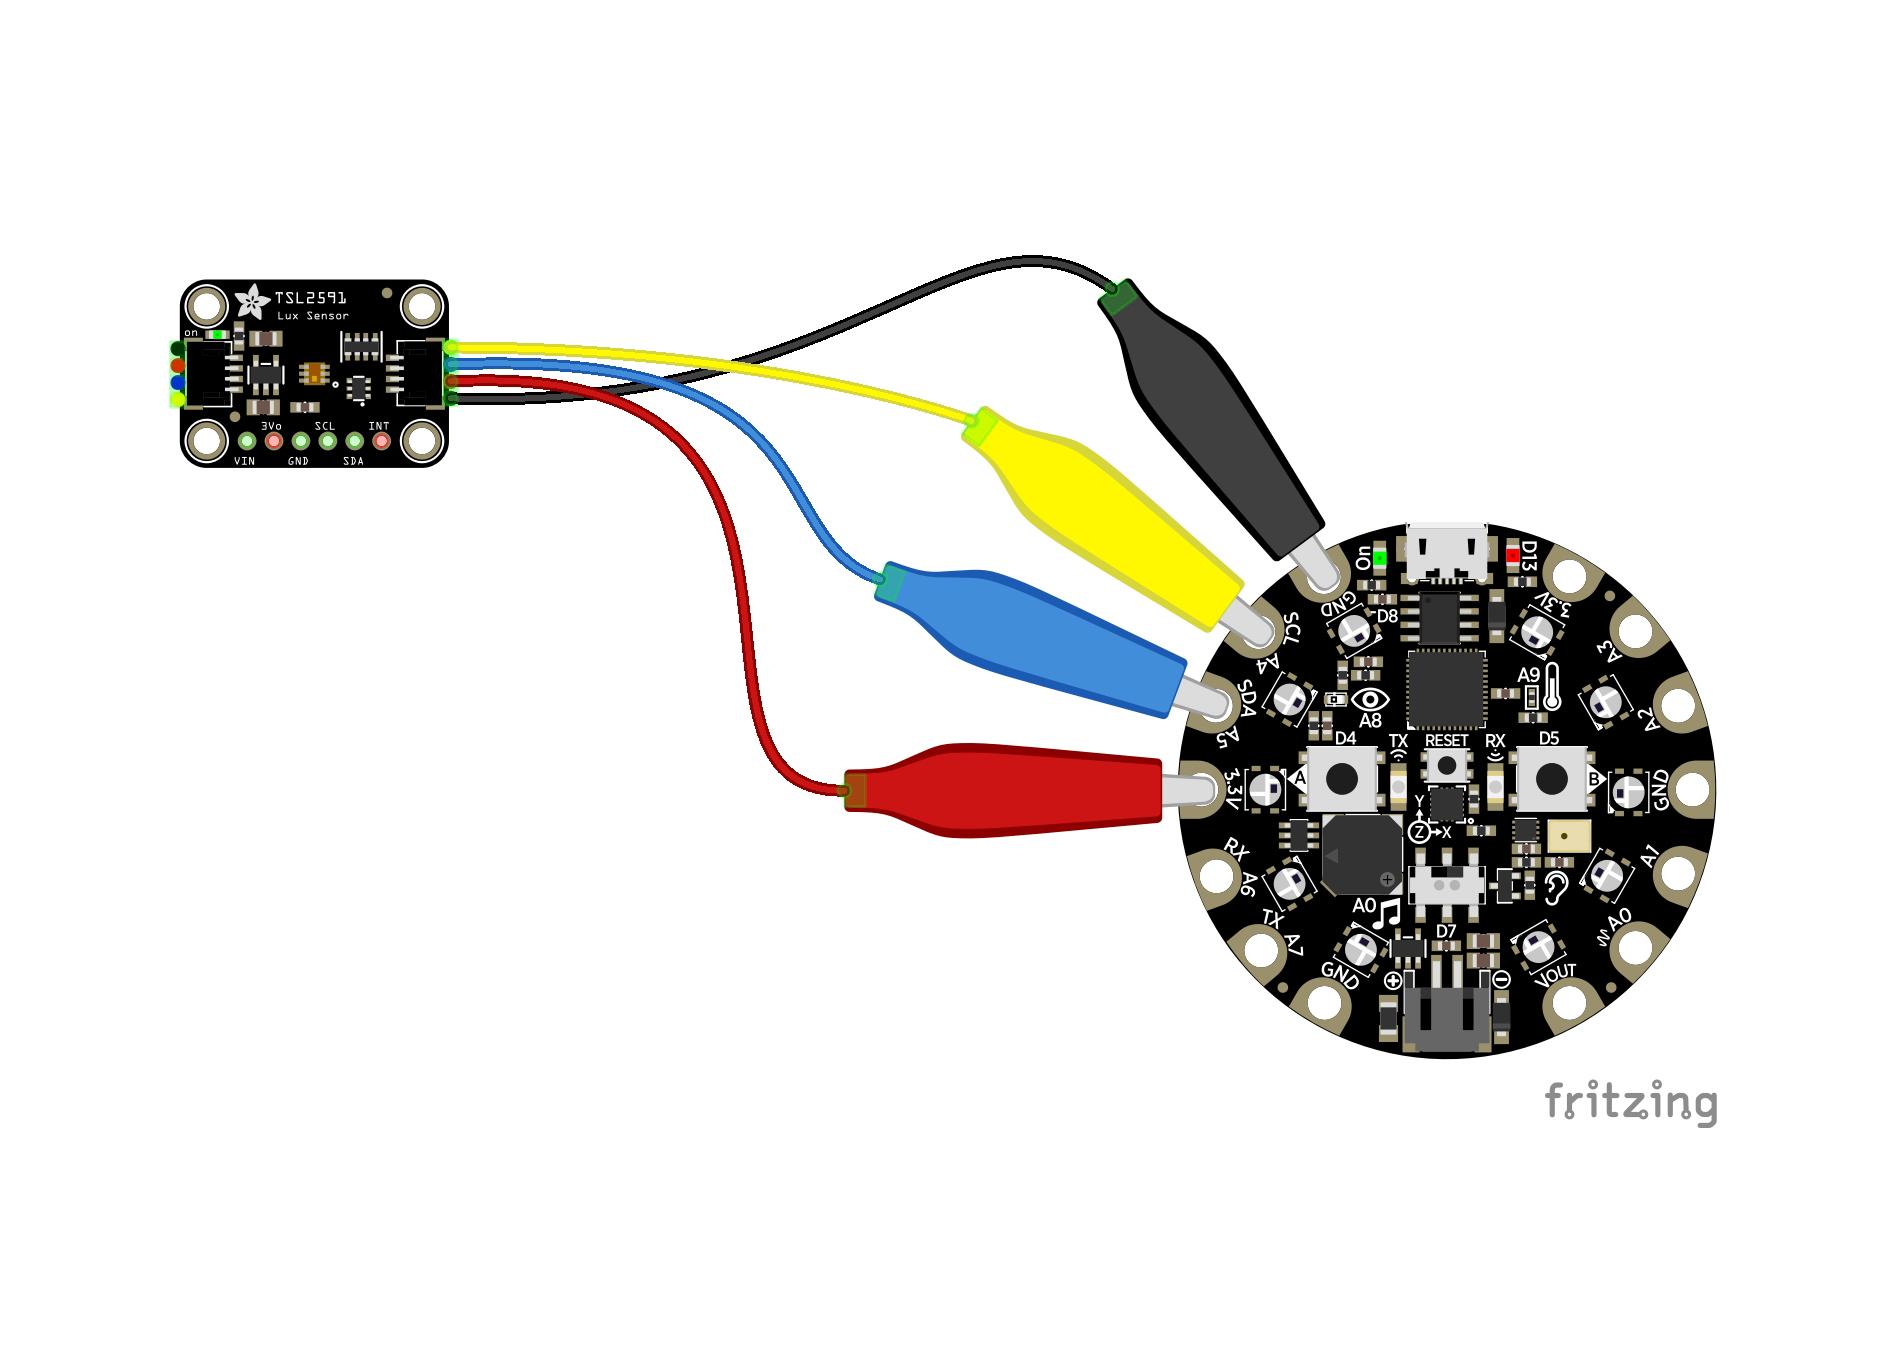 circuitpython_Essentials_I2C_CPX_bb.jpg